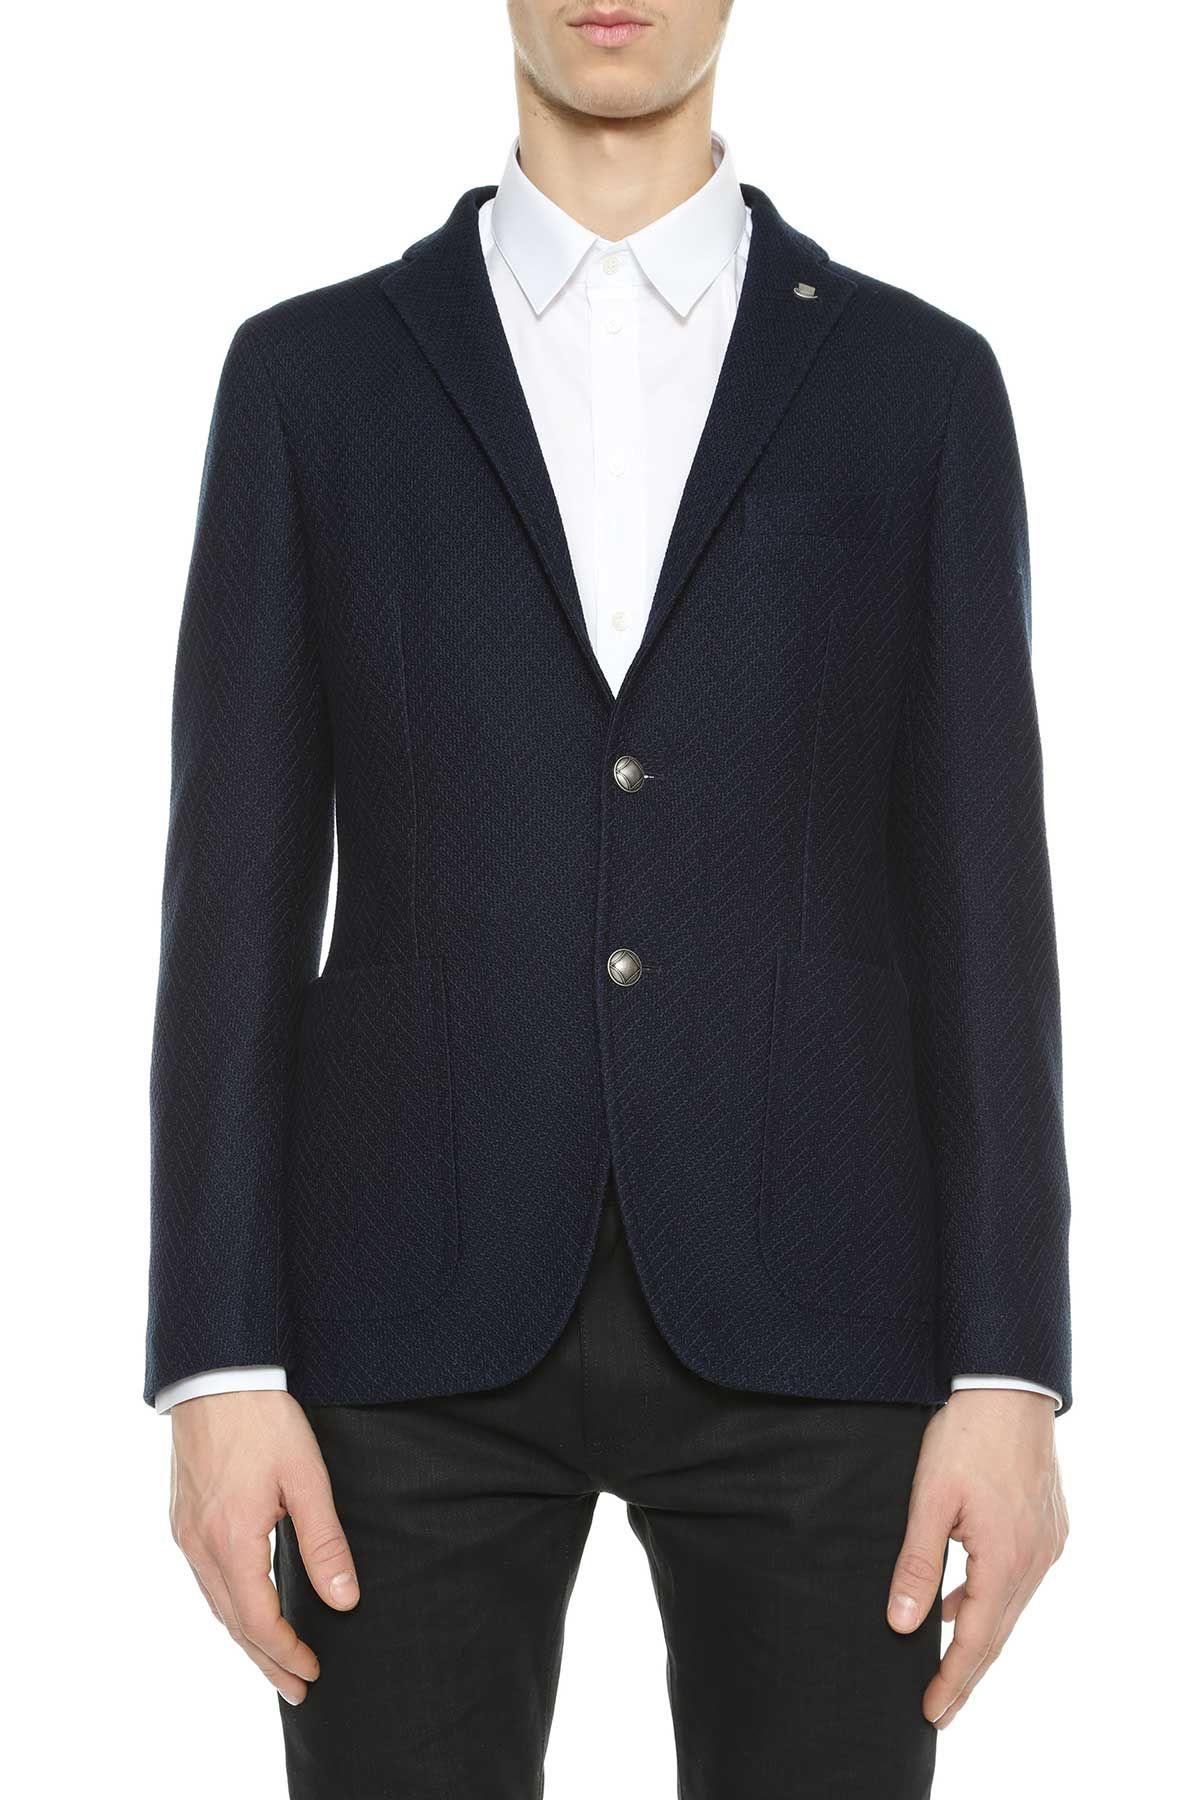 Tagliatore Chevron Jersey Jacket